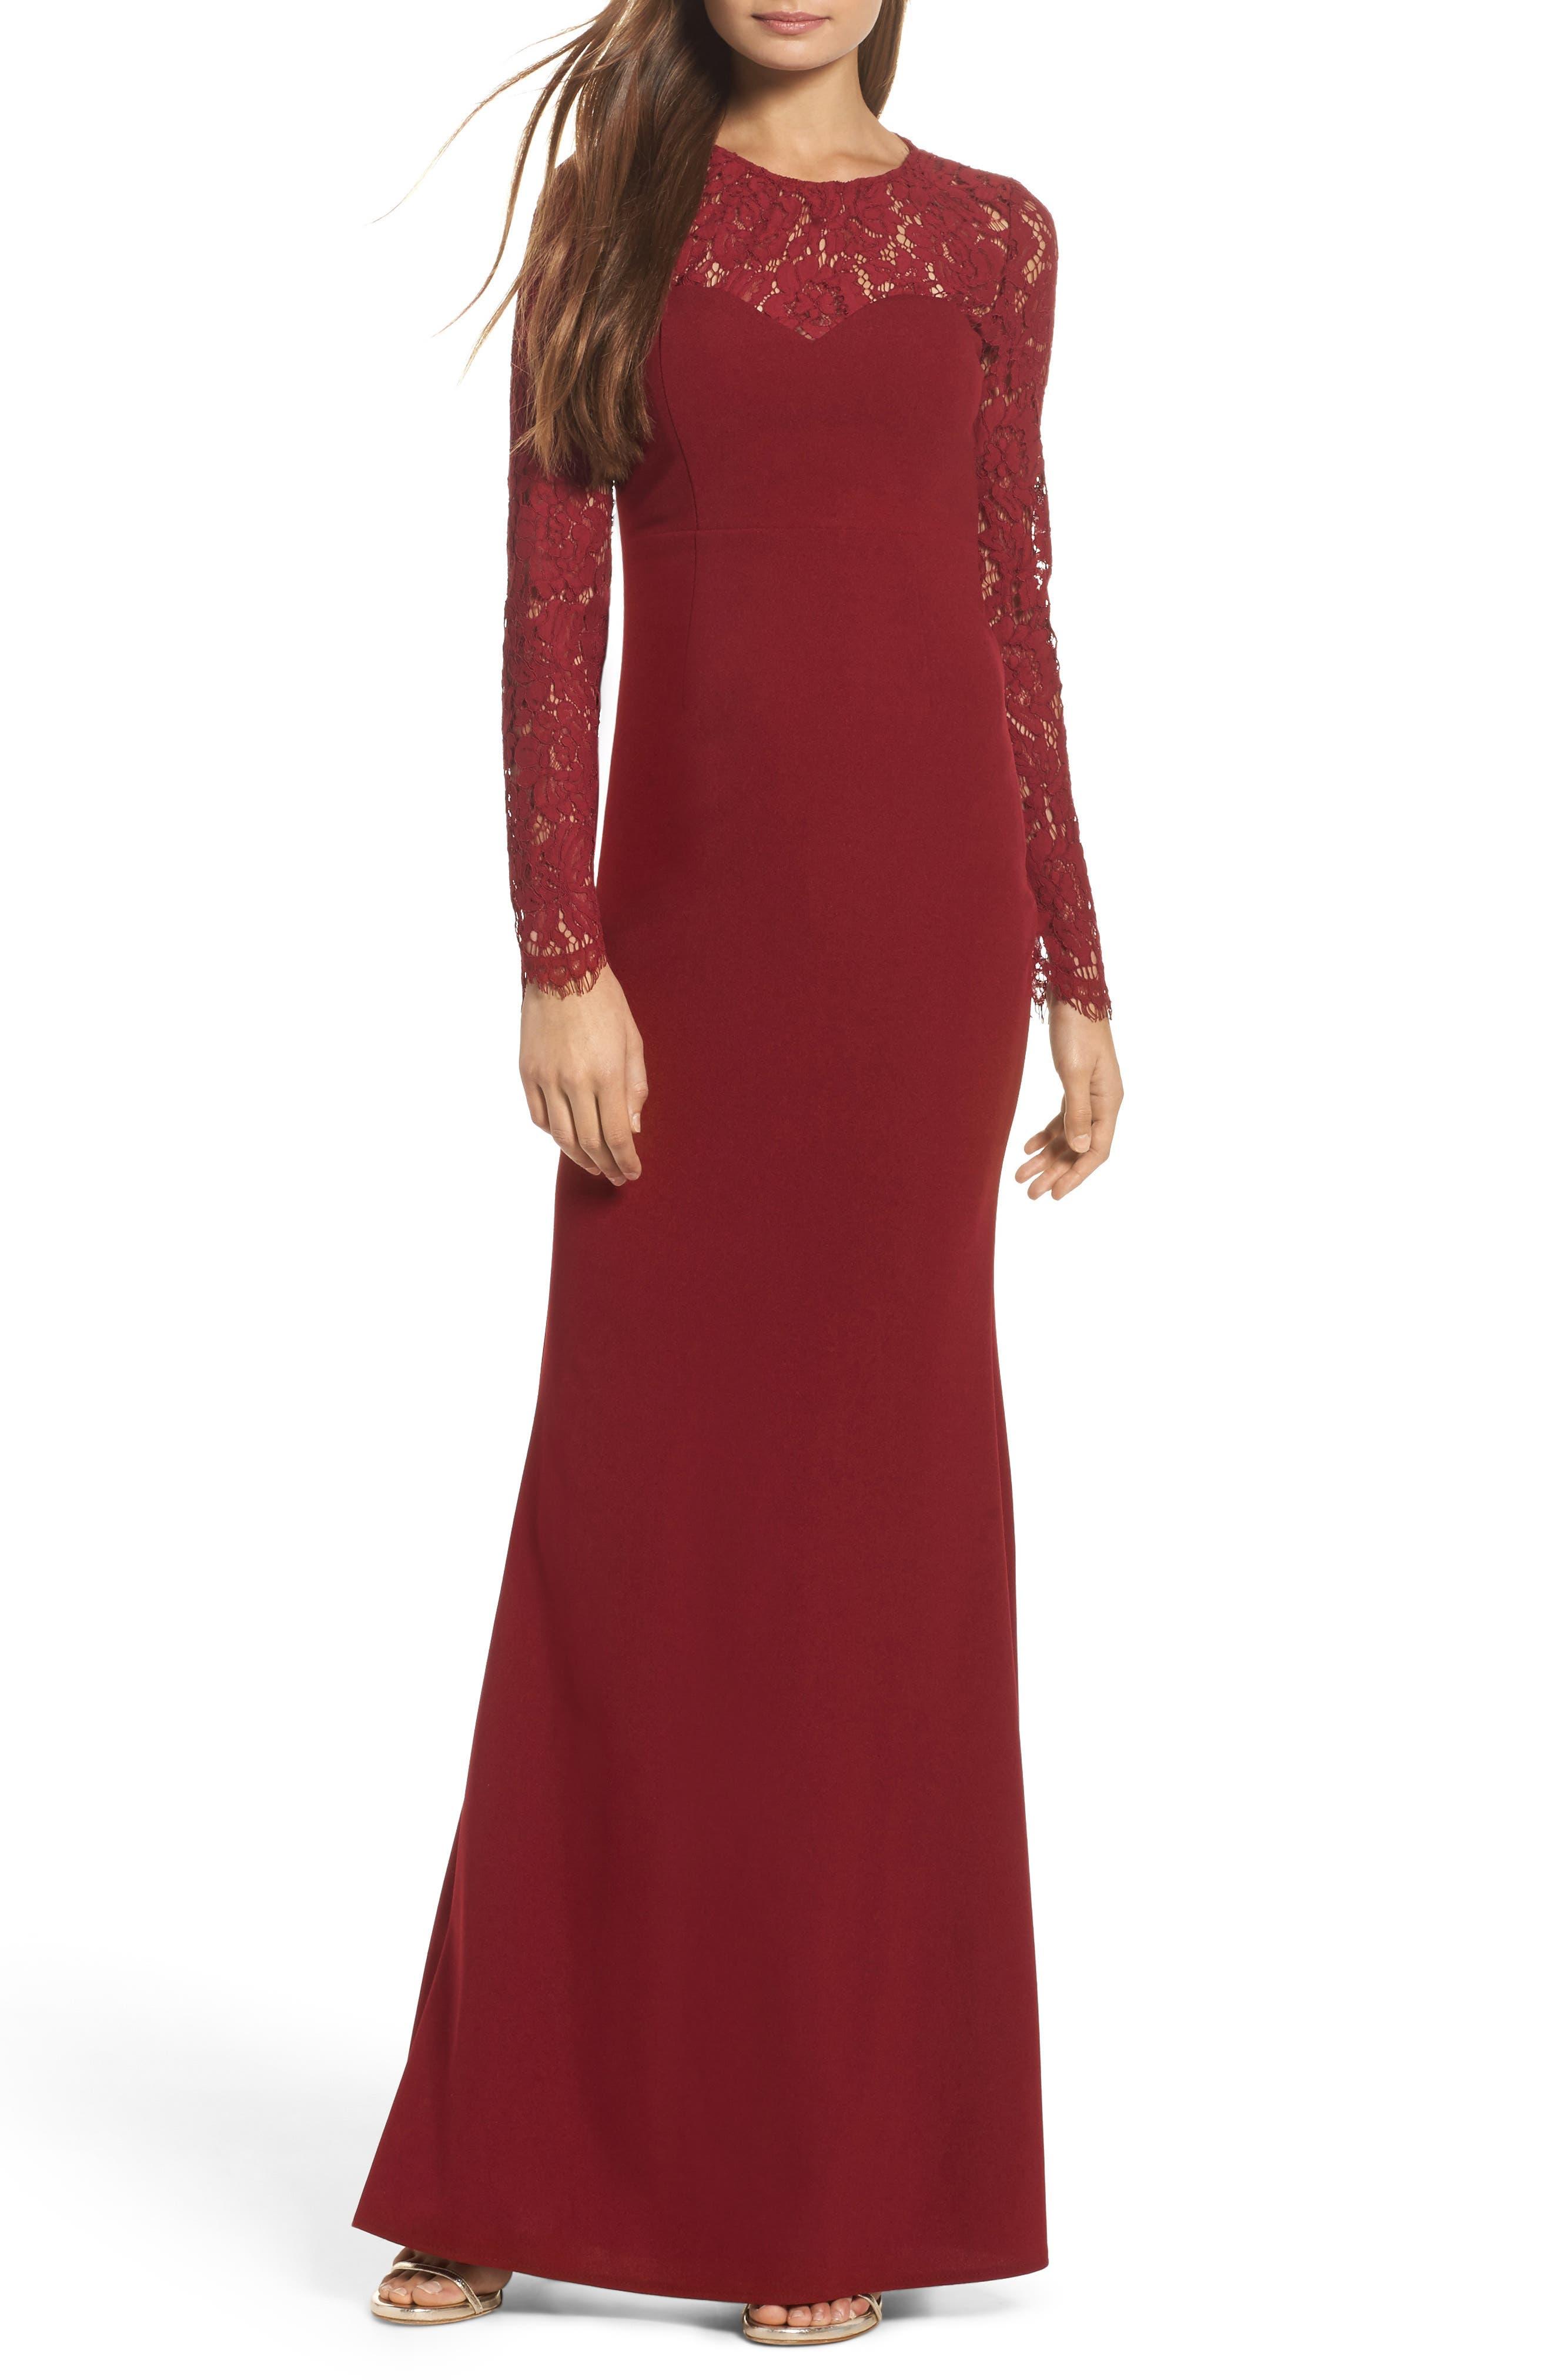 Main Image - Lulus Whenever You Call Maxi Dress